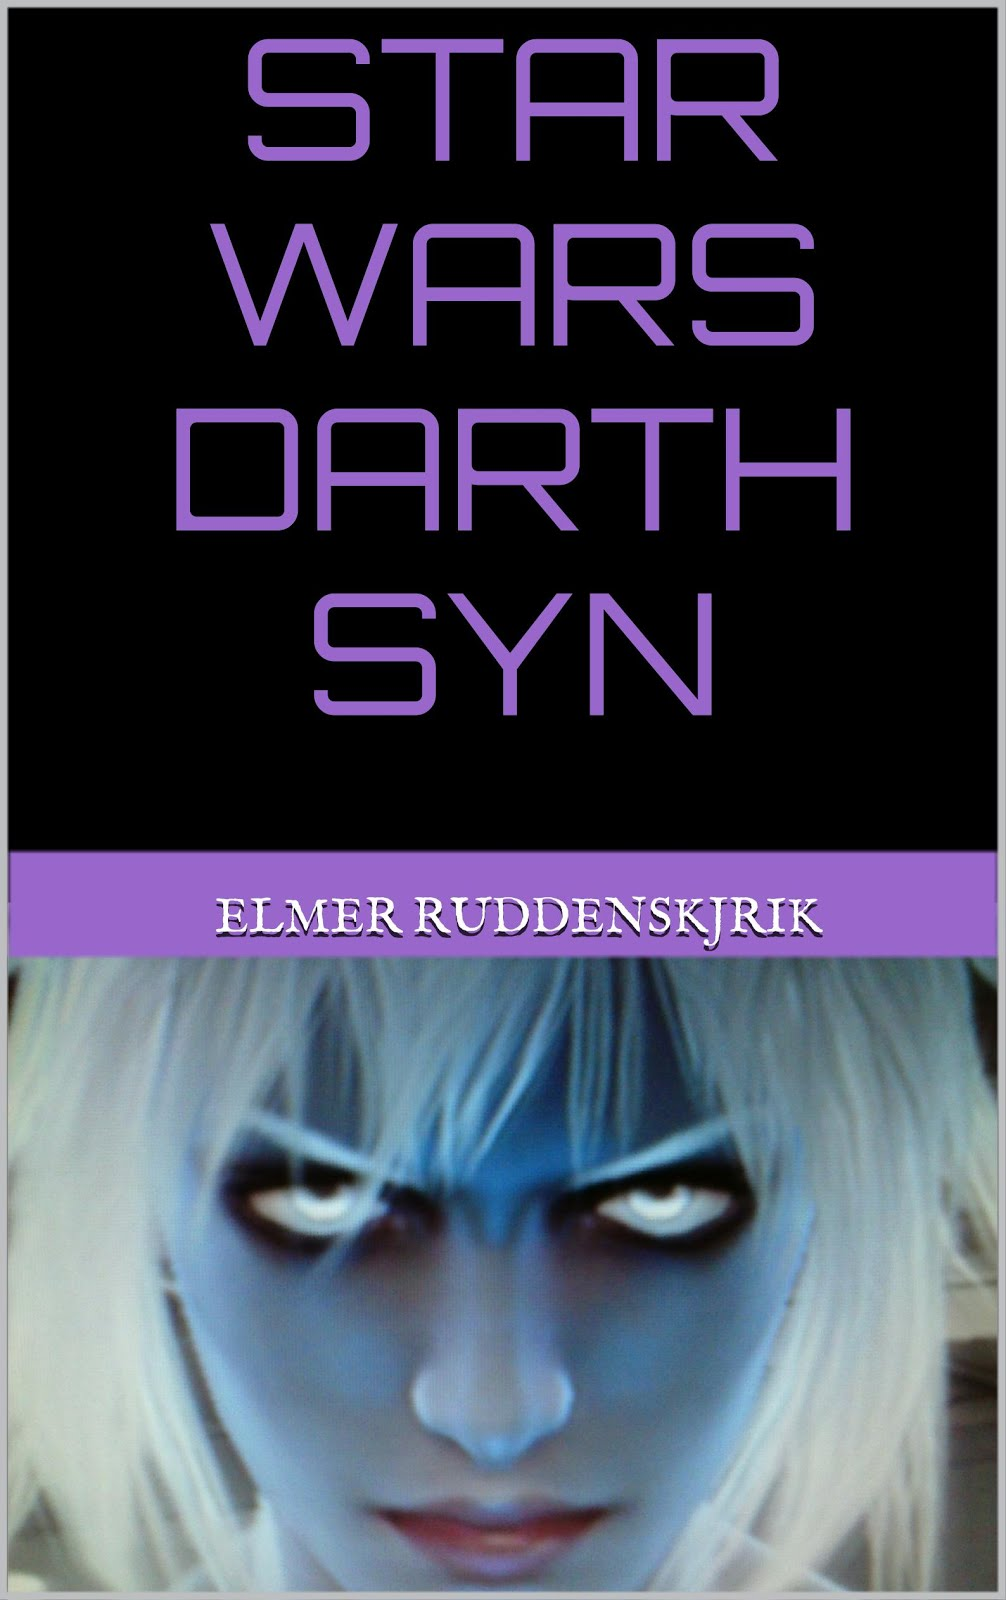 Novela Darth Syn